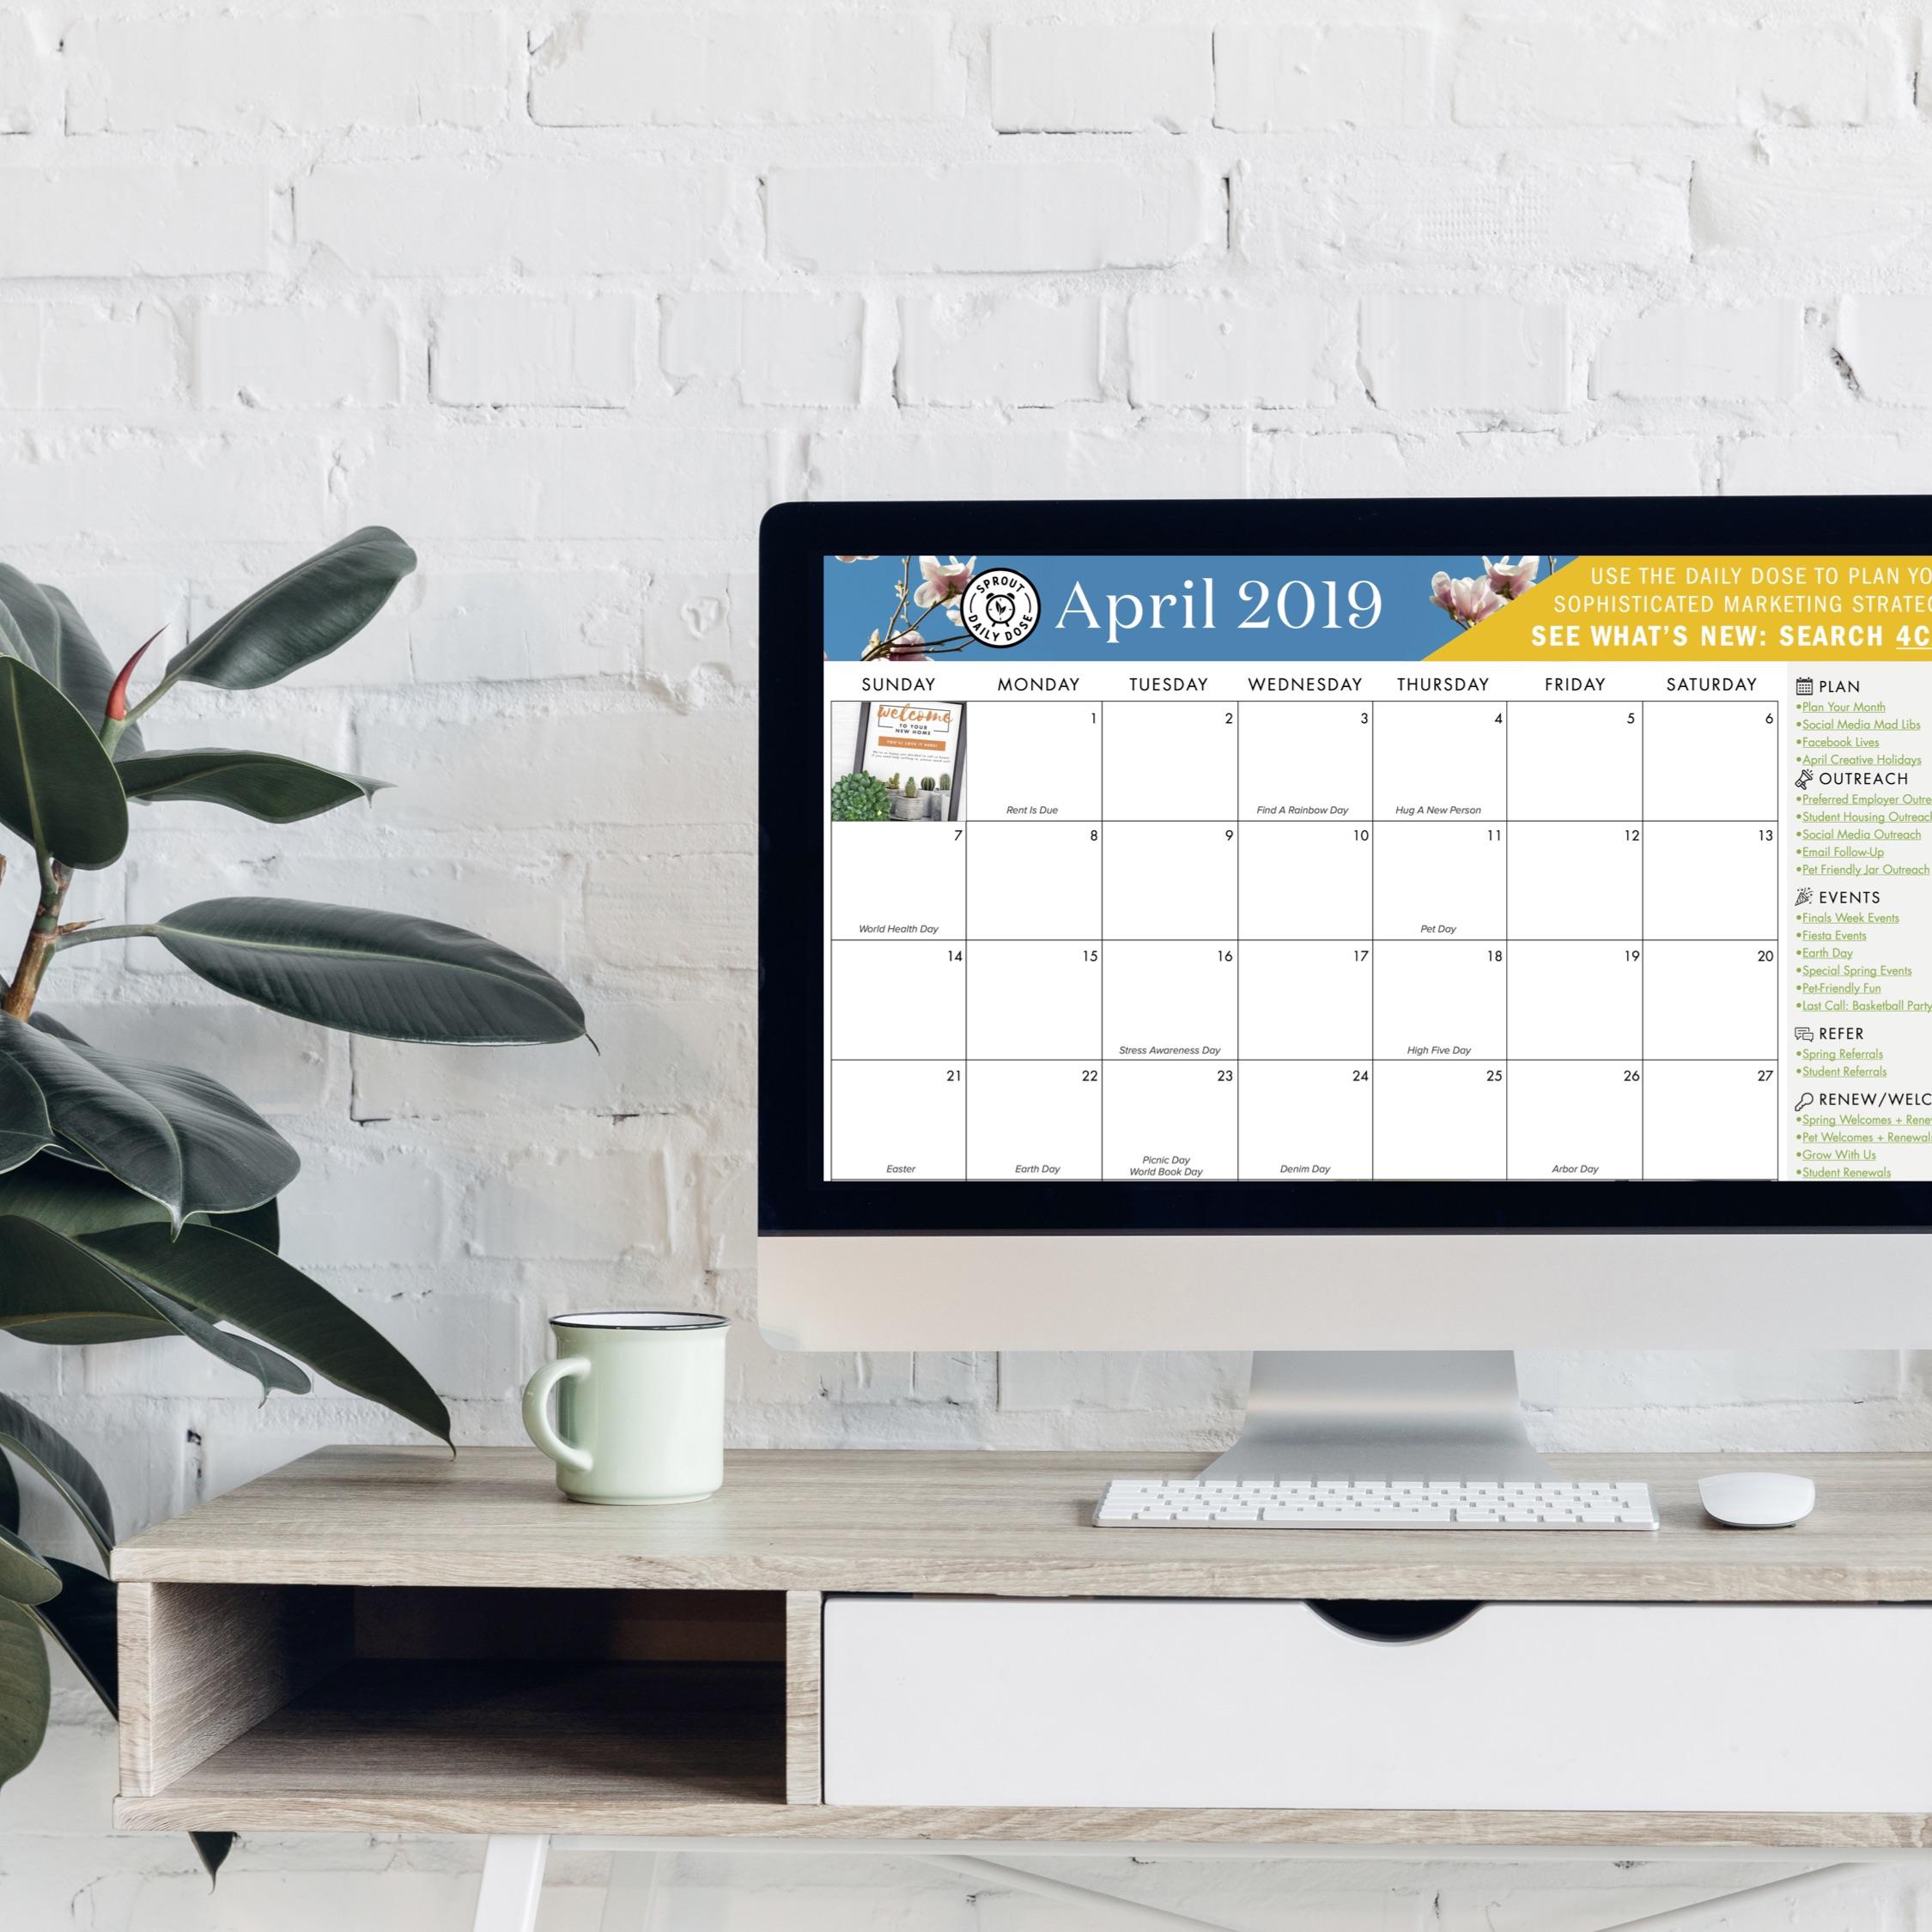 APR19 DD April Calendar.jpg